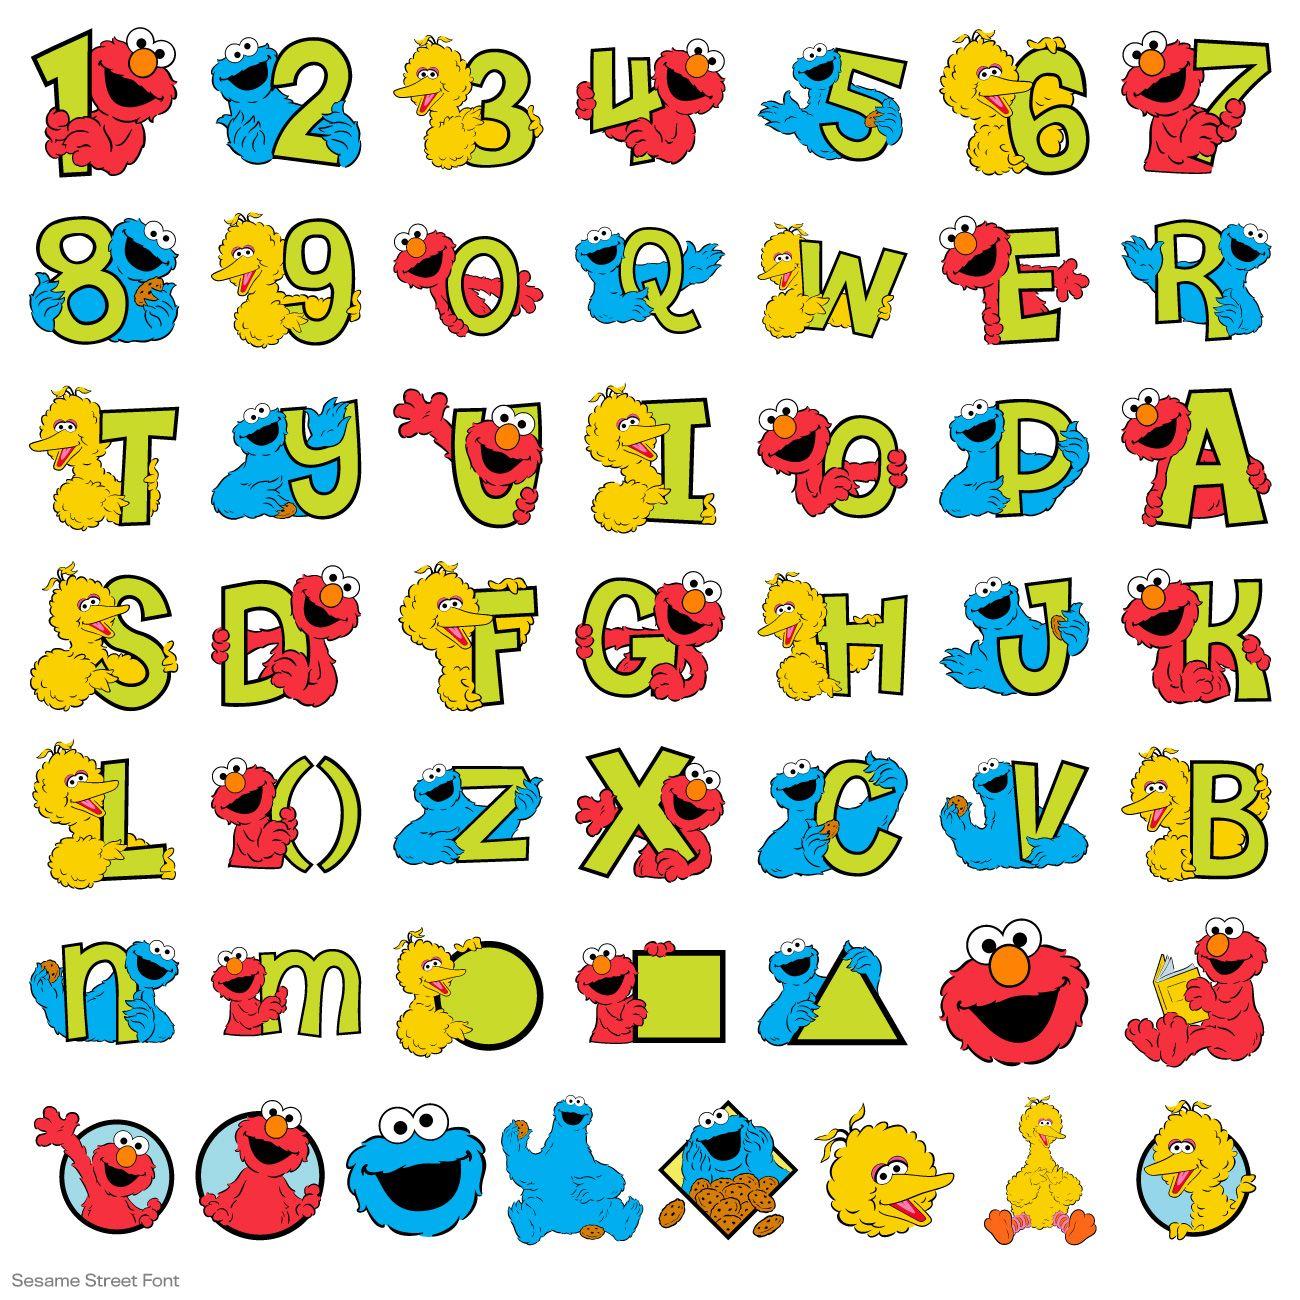 Sesame Street® Font - Sesame Street - Licensed Designs ...